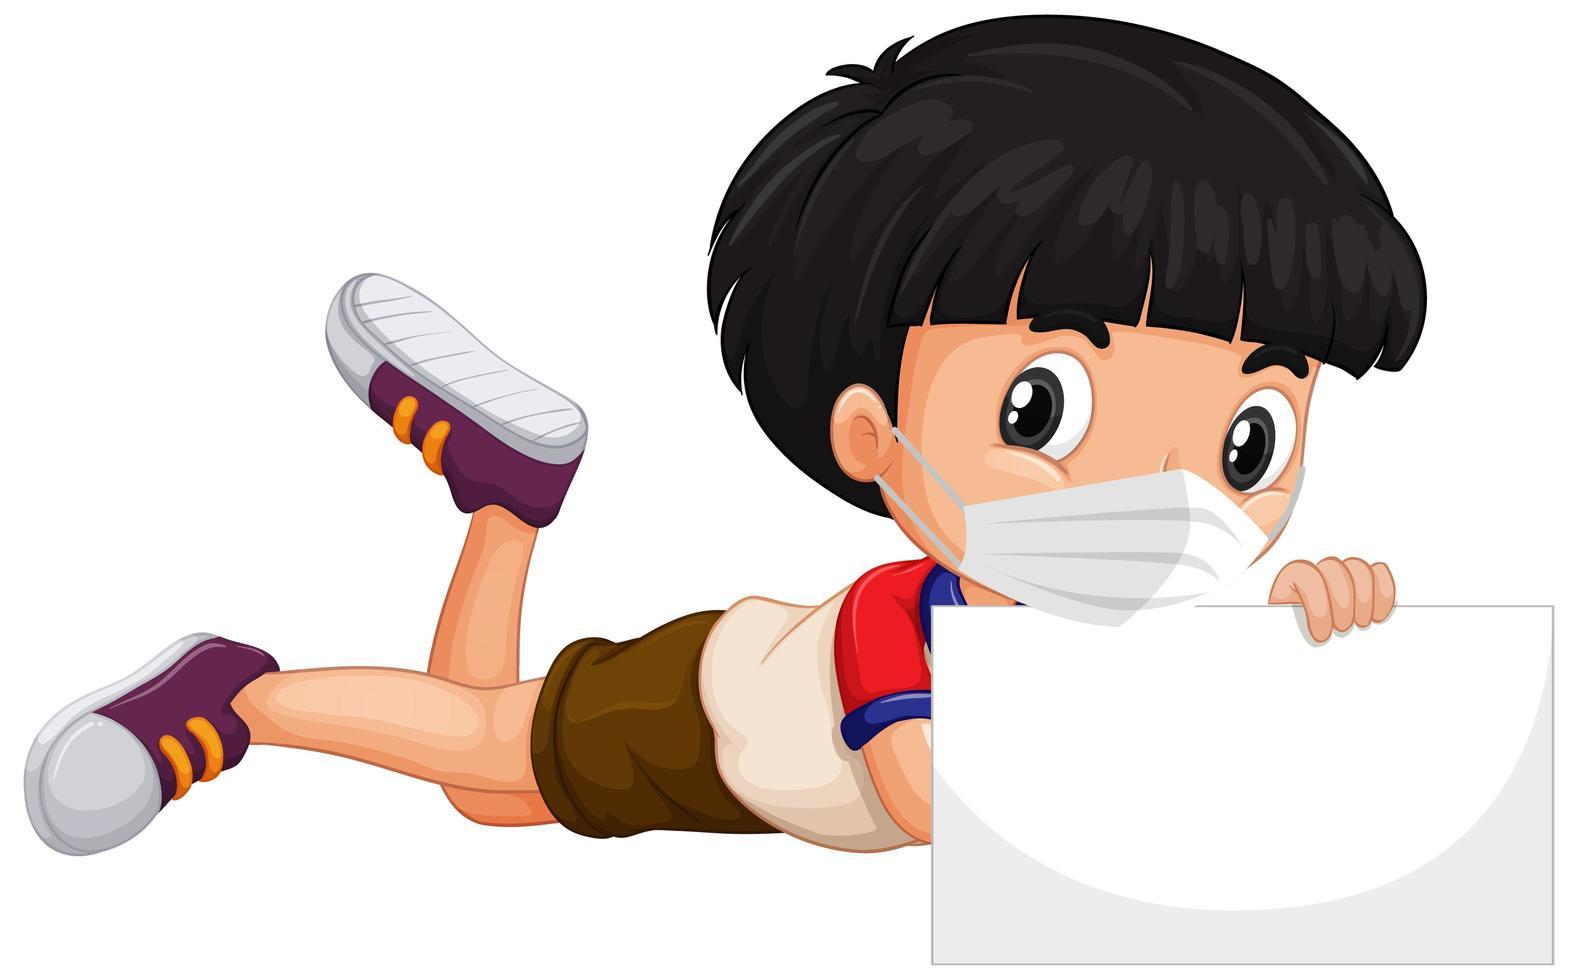 Junge mit Gesichtsmaske, die leeres Banner hält vektor